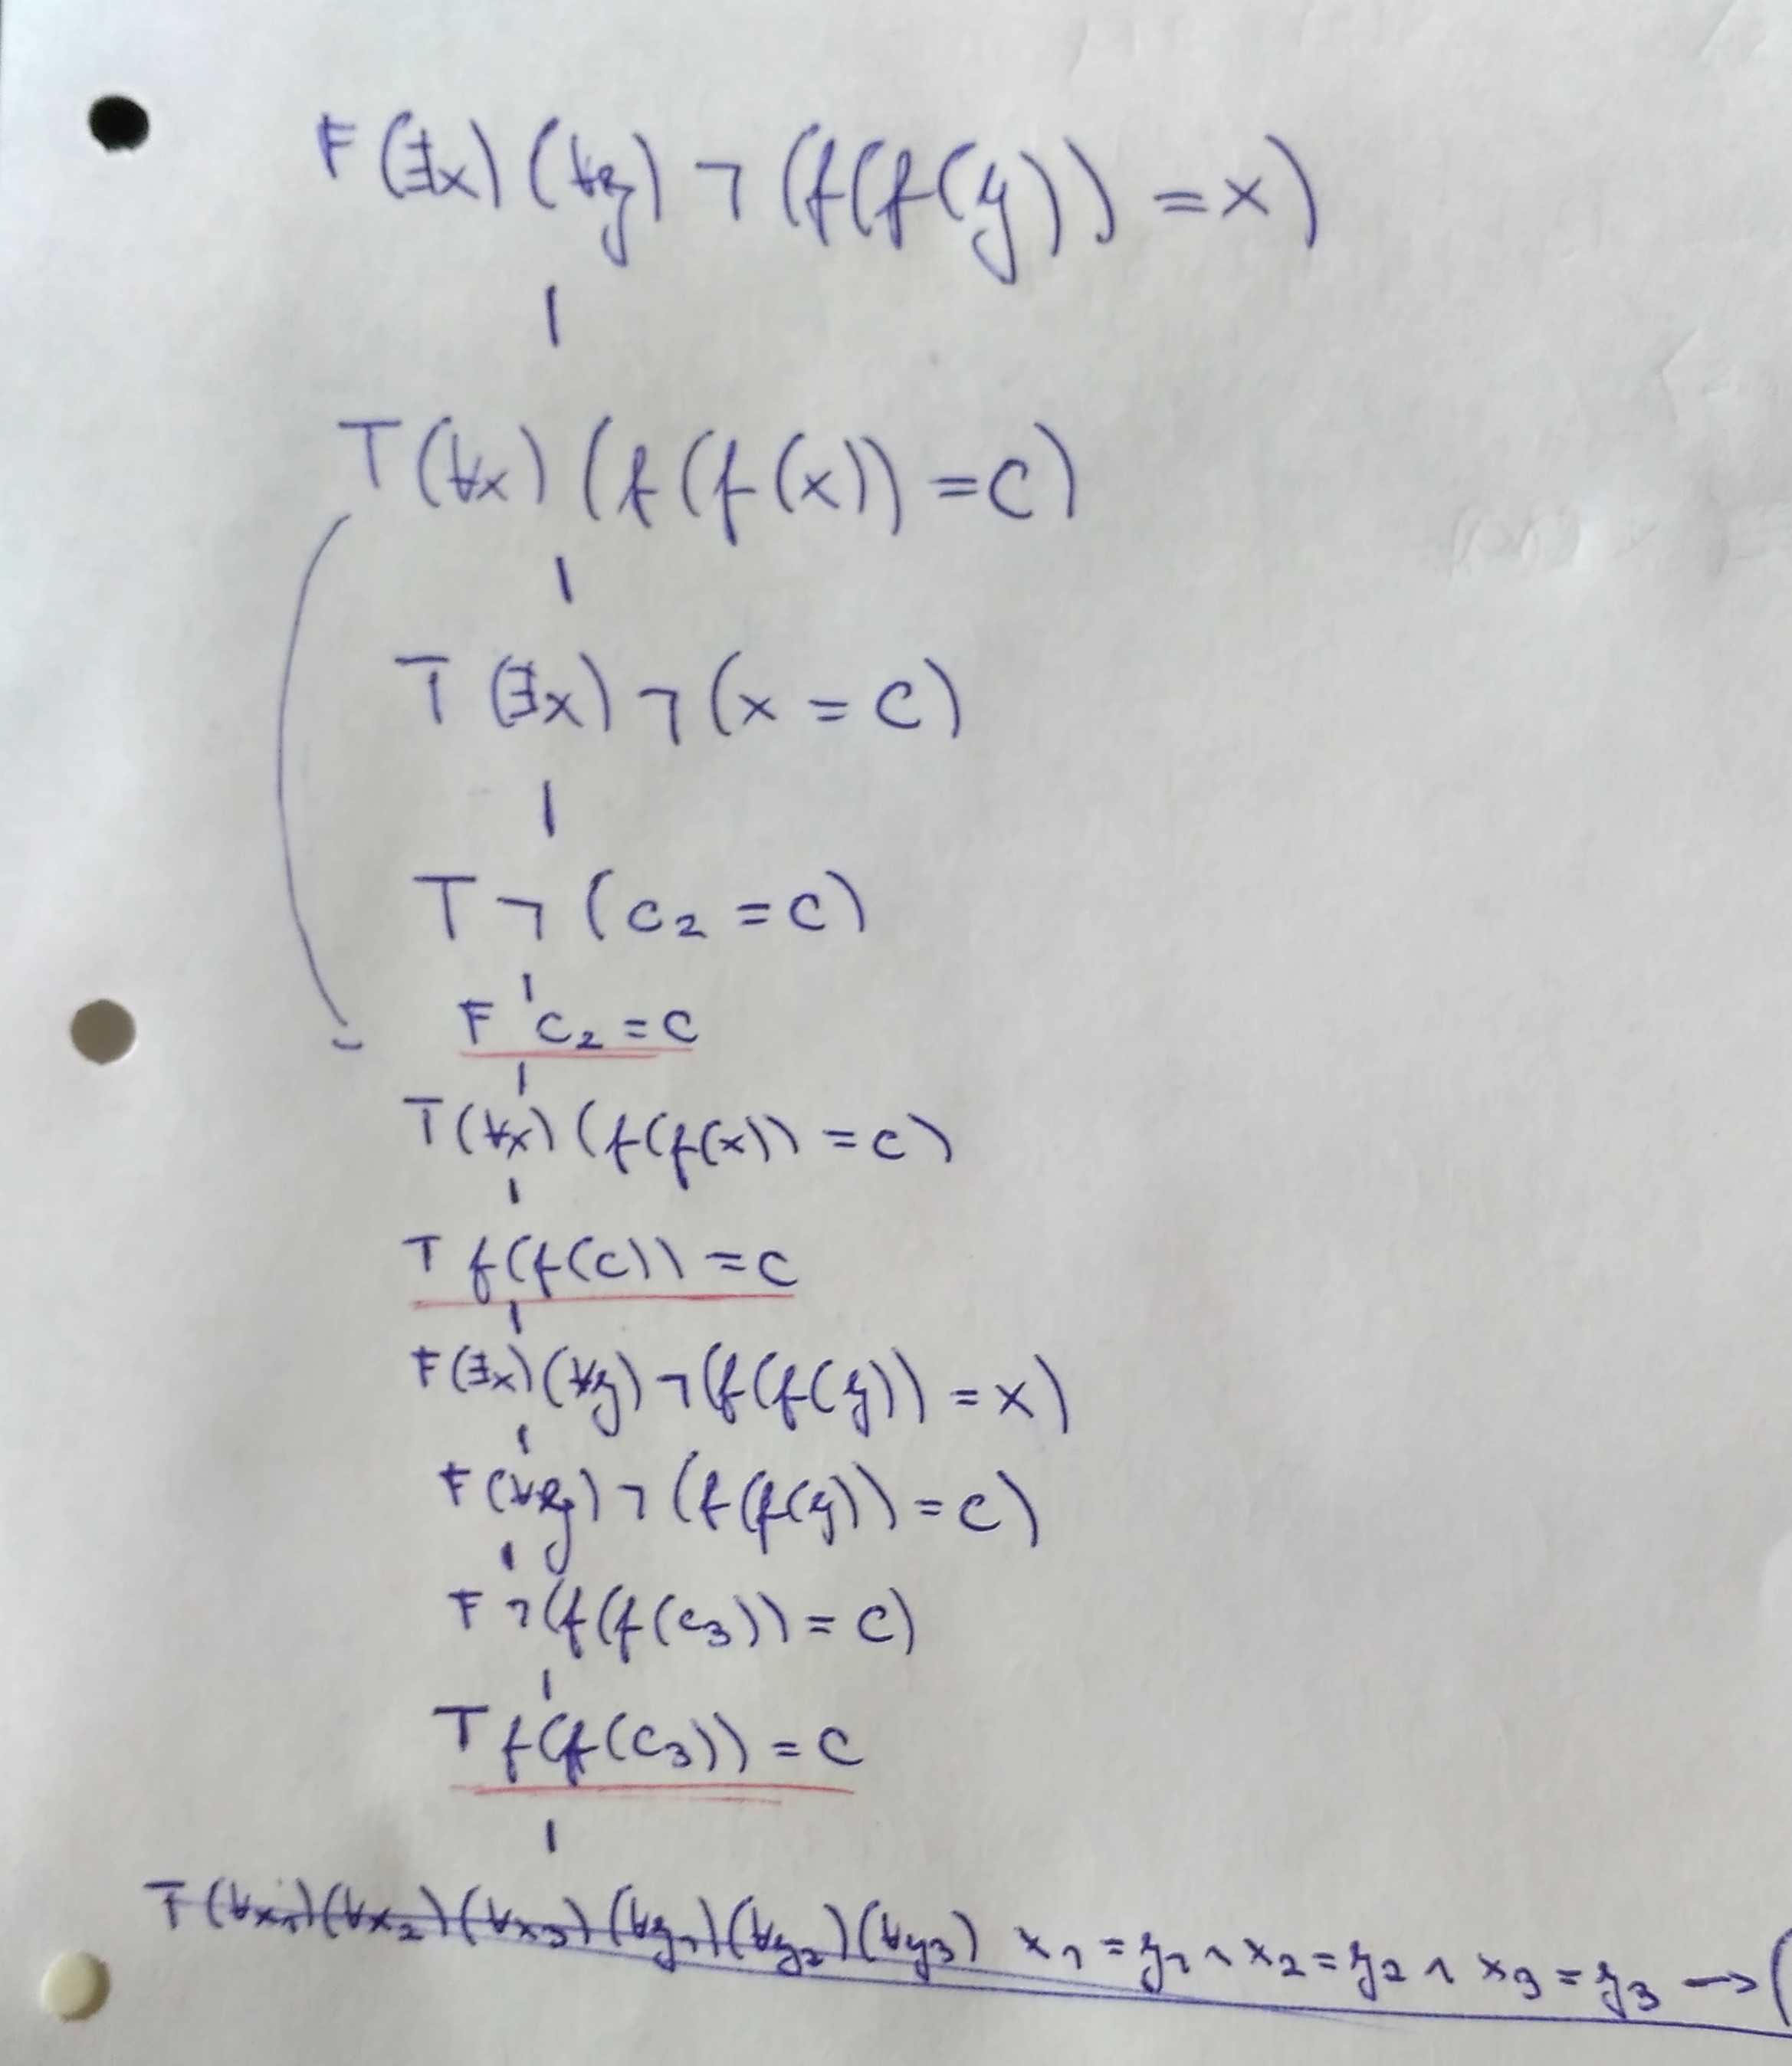 http://forum.matematika.cz/upload3/img/2018-02/47466_IMG_20180203_093857_HDR.jpg